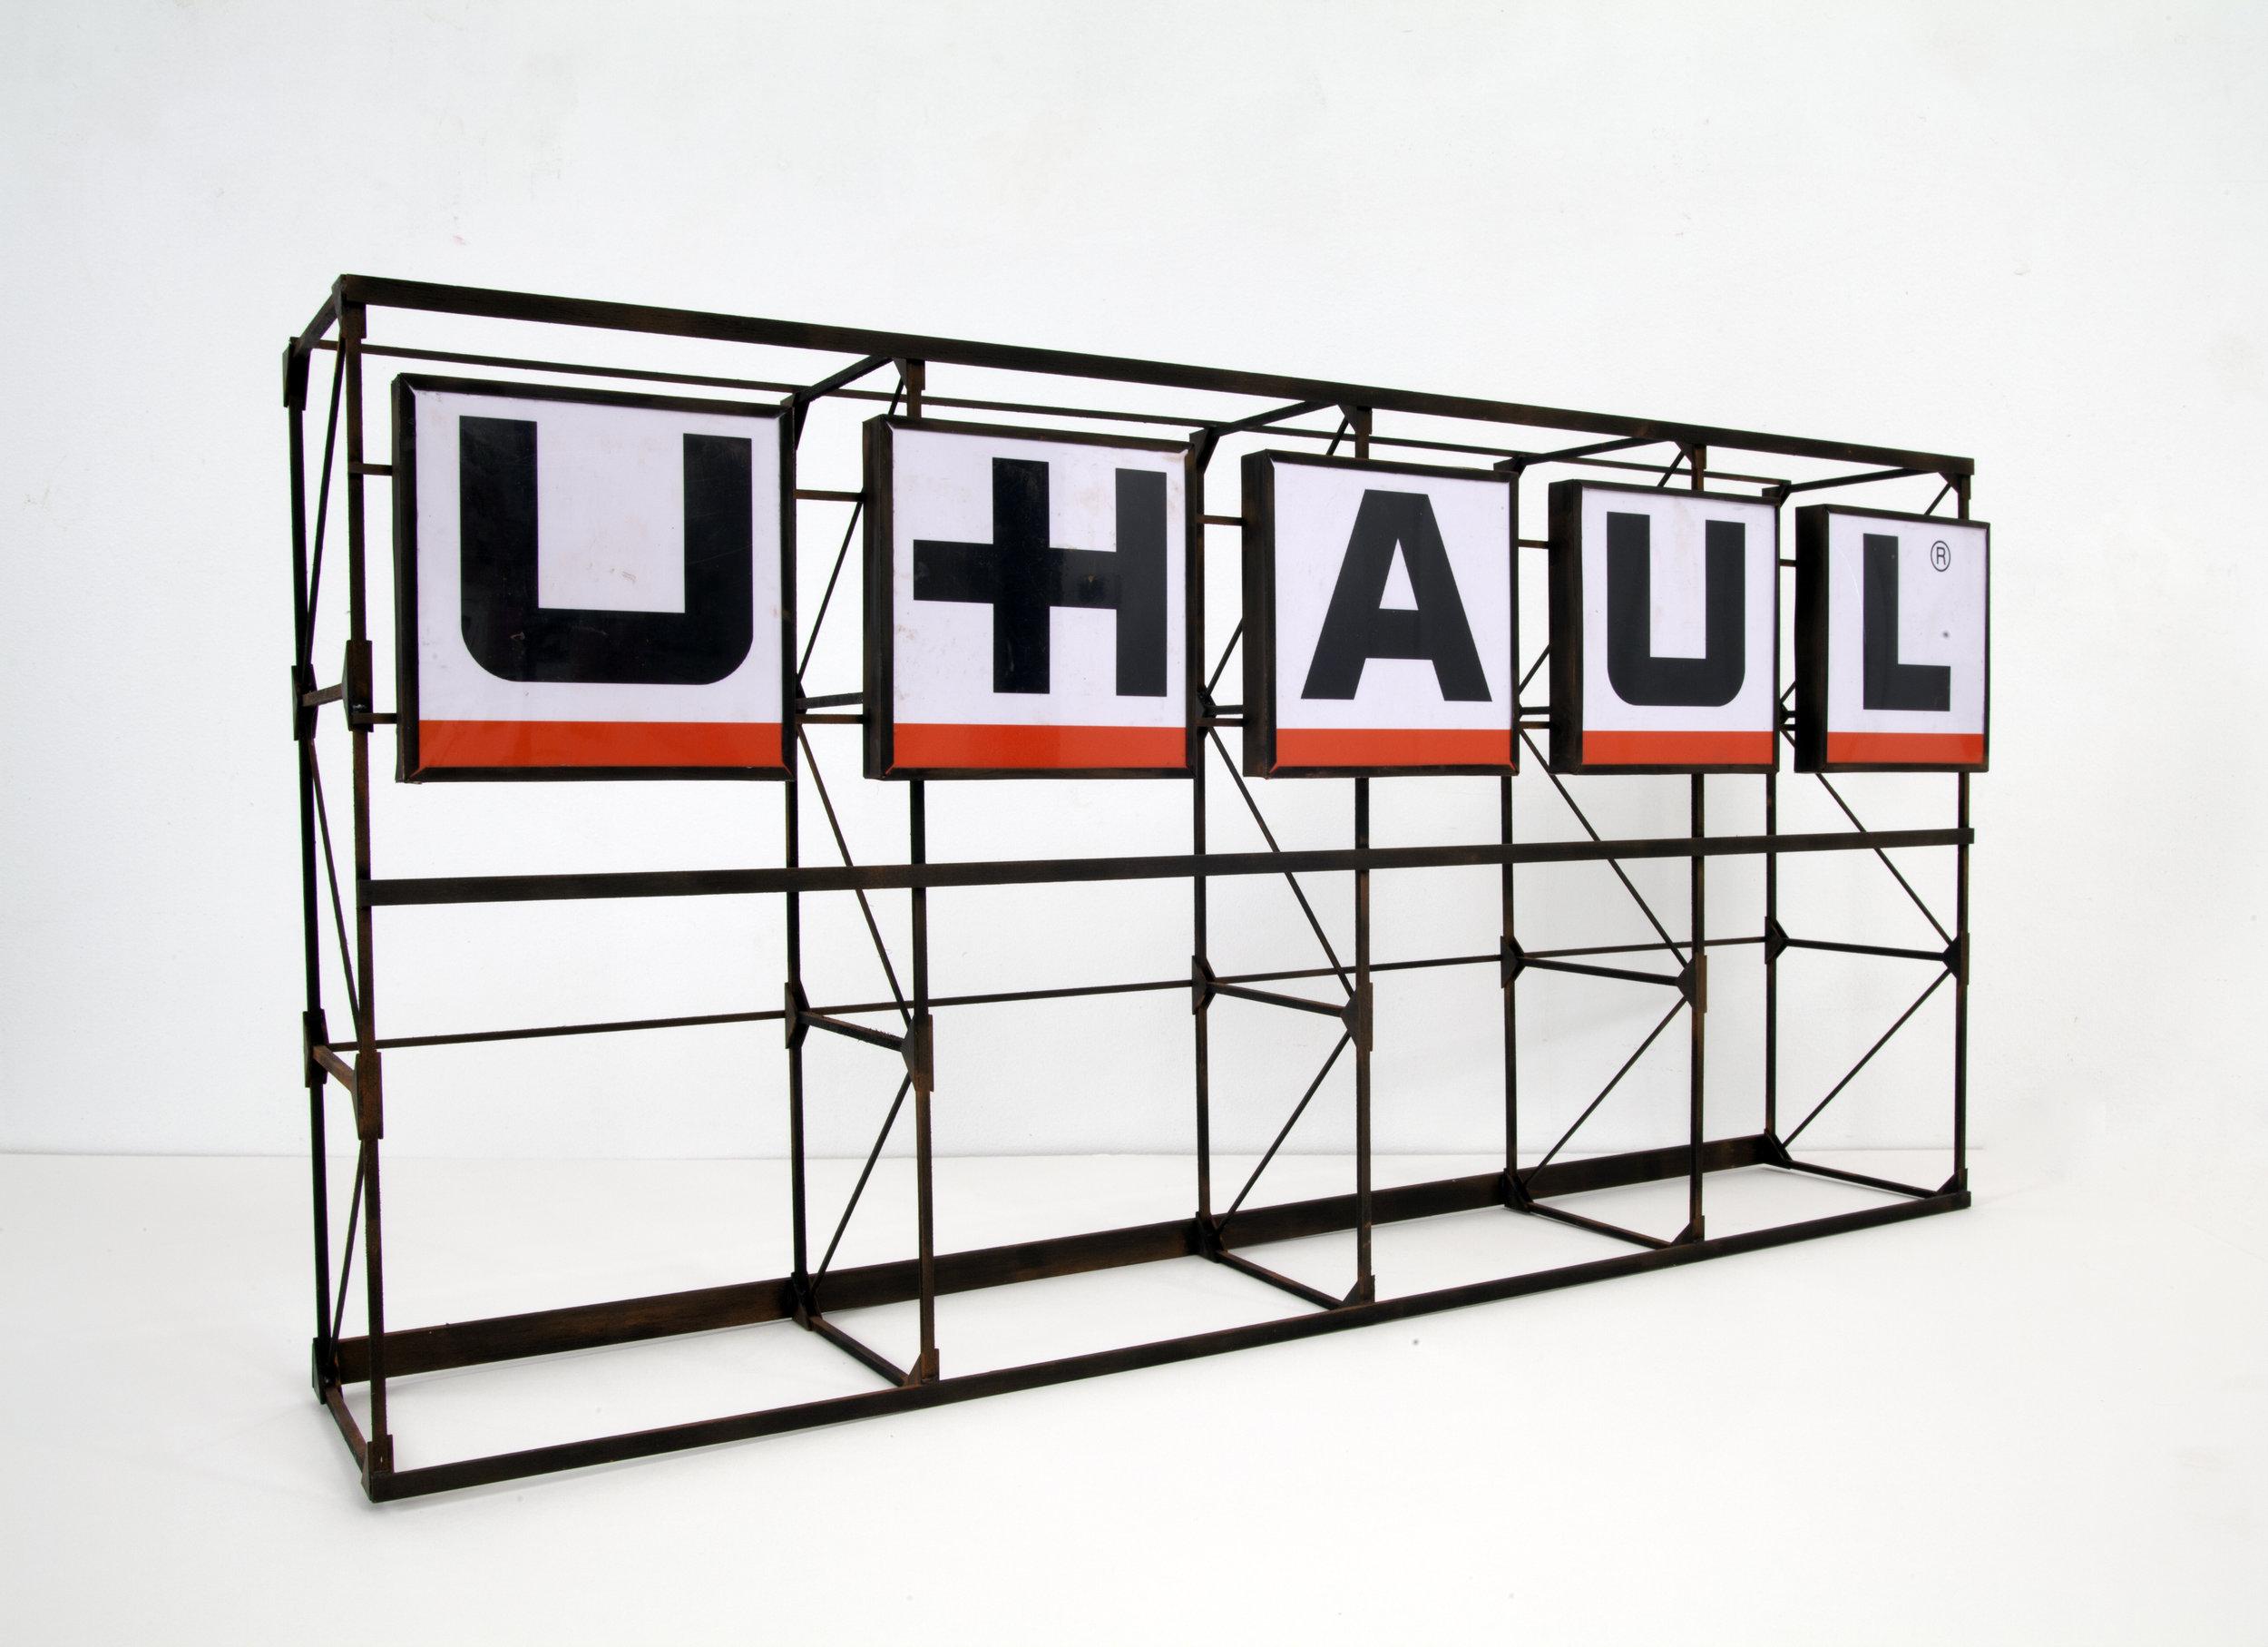 U Haul Sign - SOLD